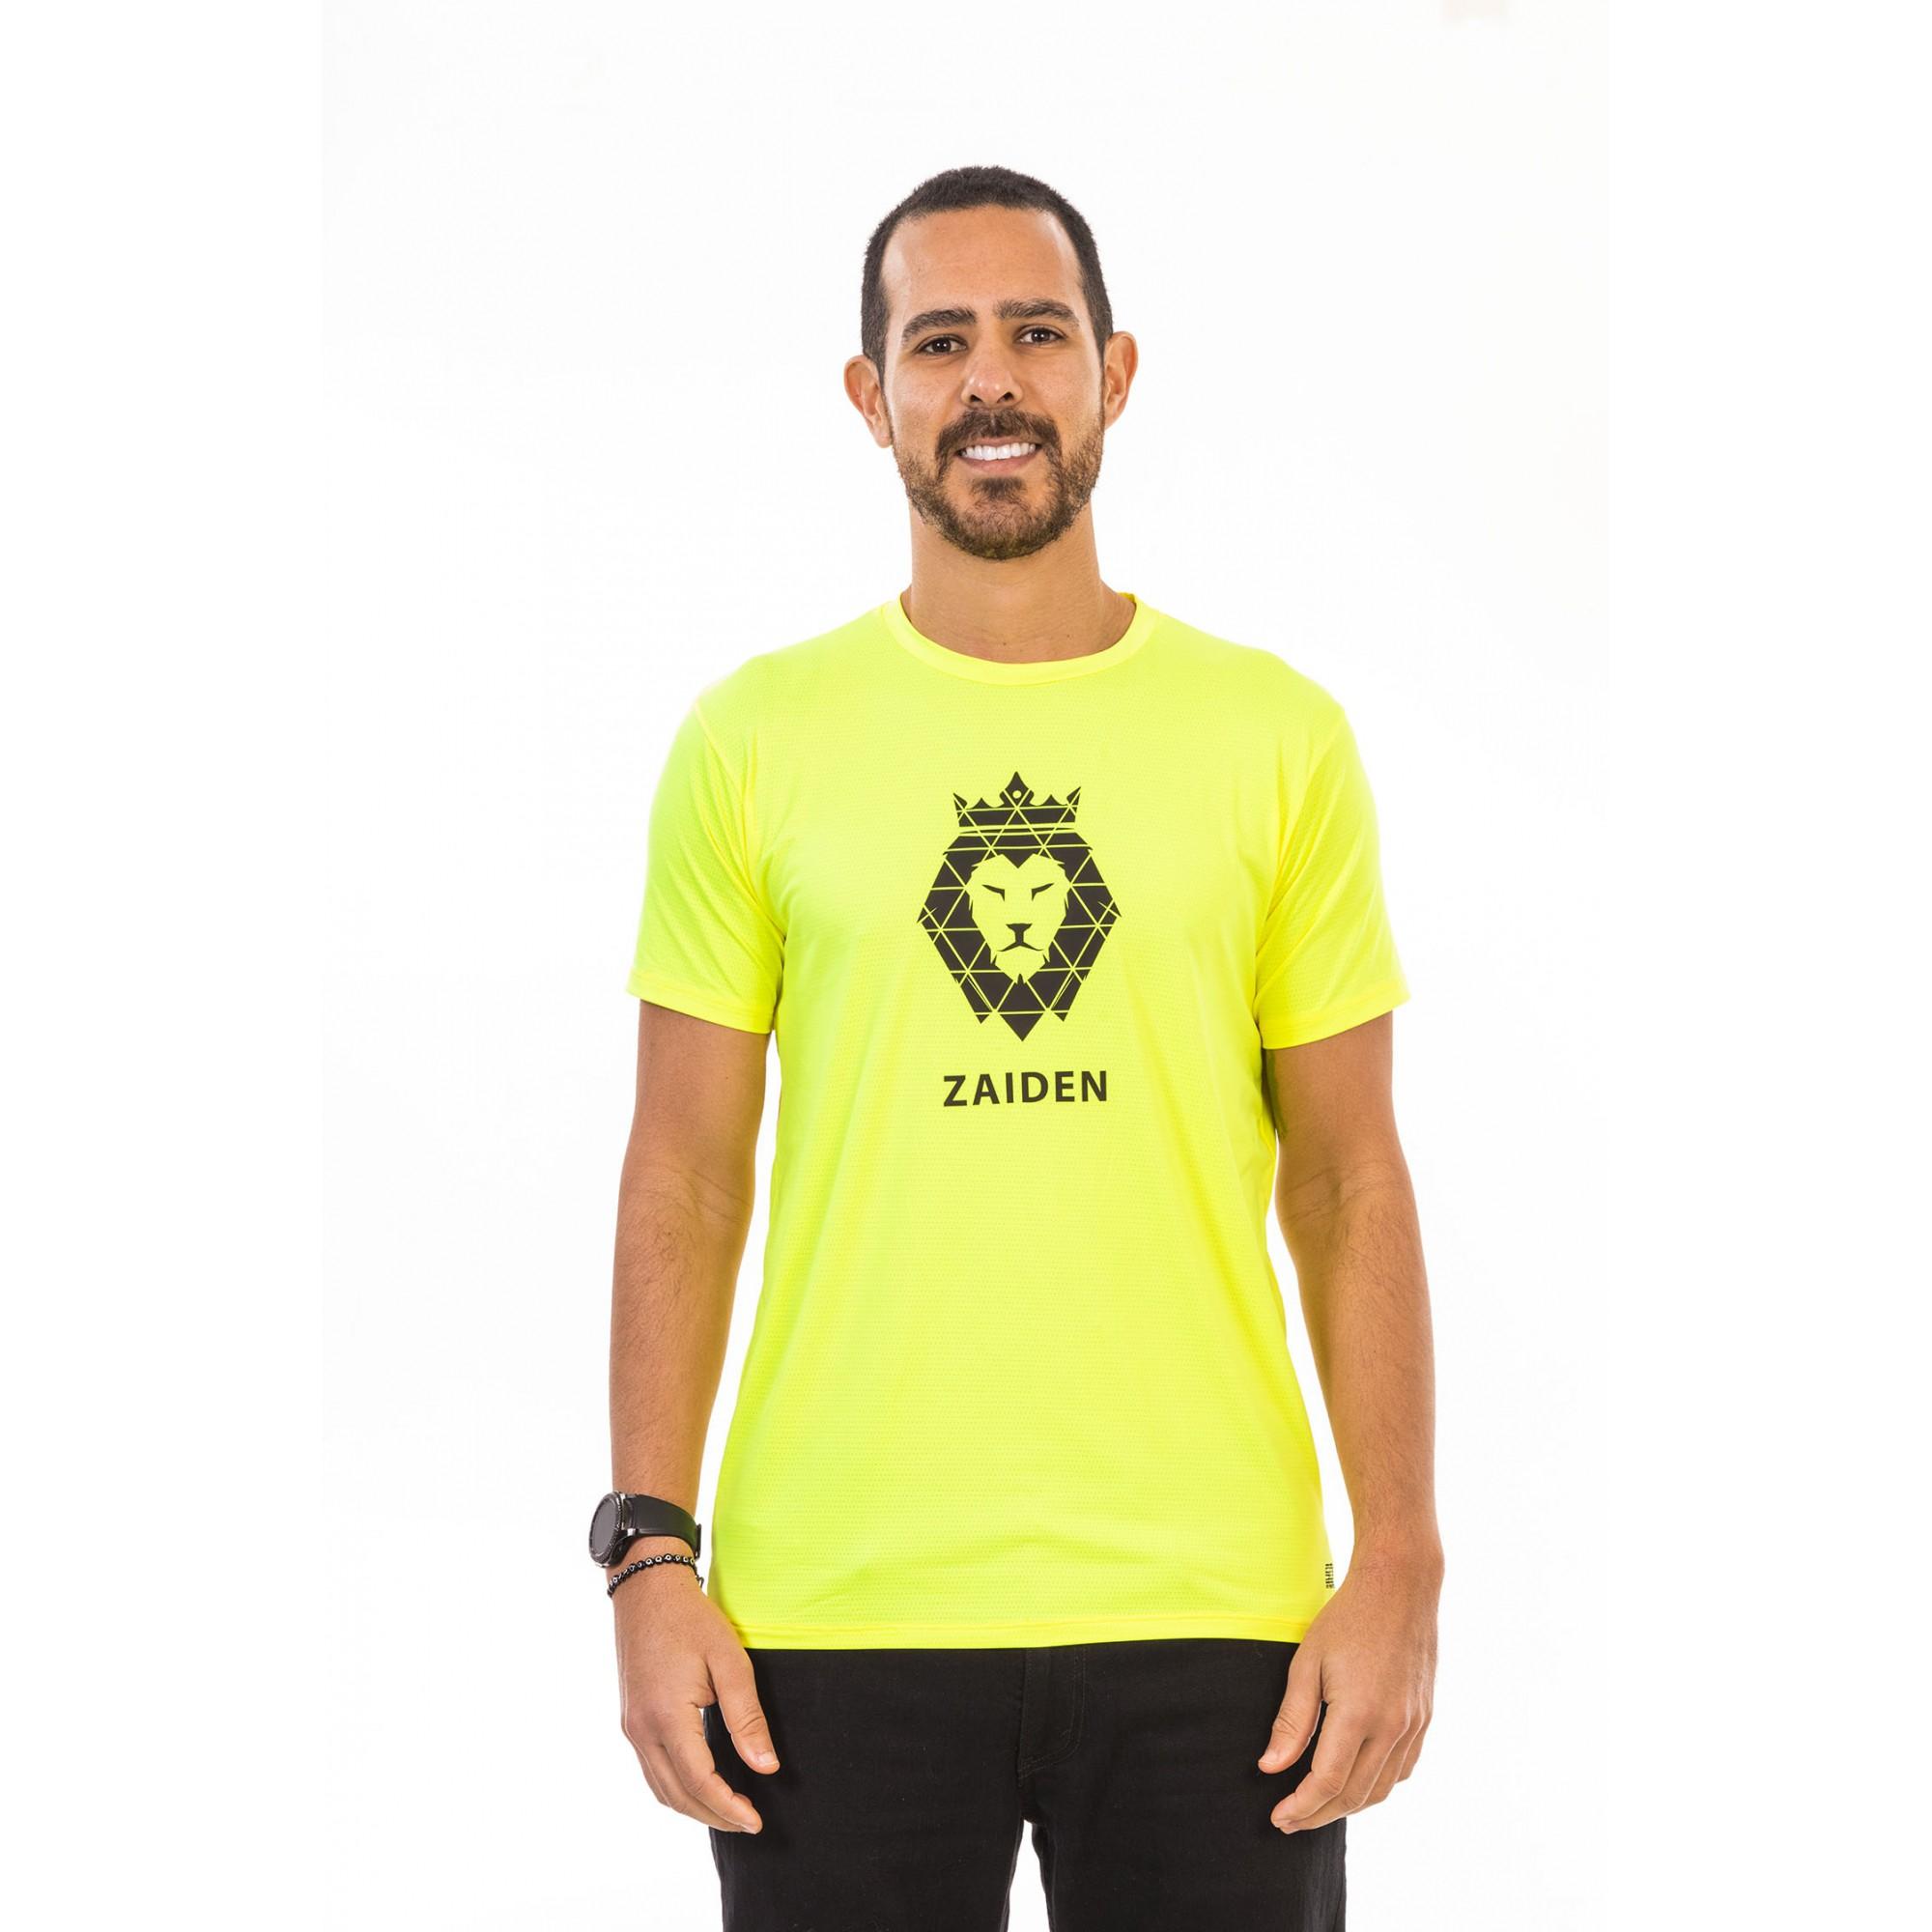 Camiseta Masculina Poliamida Isla Zaiden Leão Preto